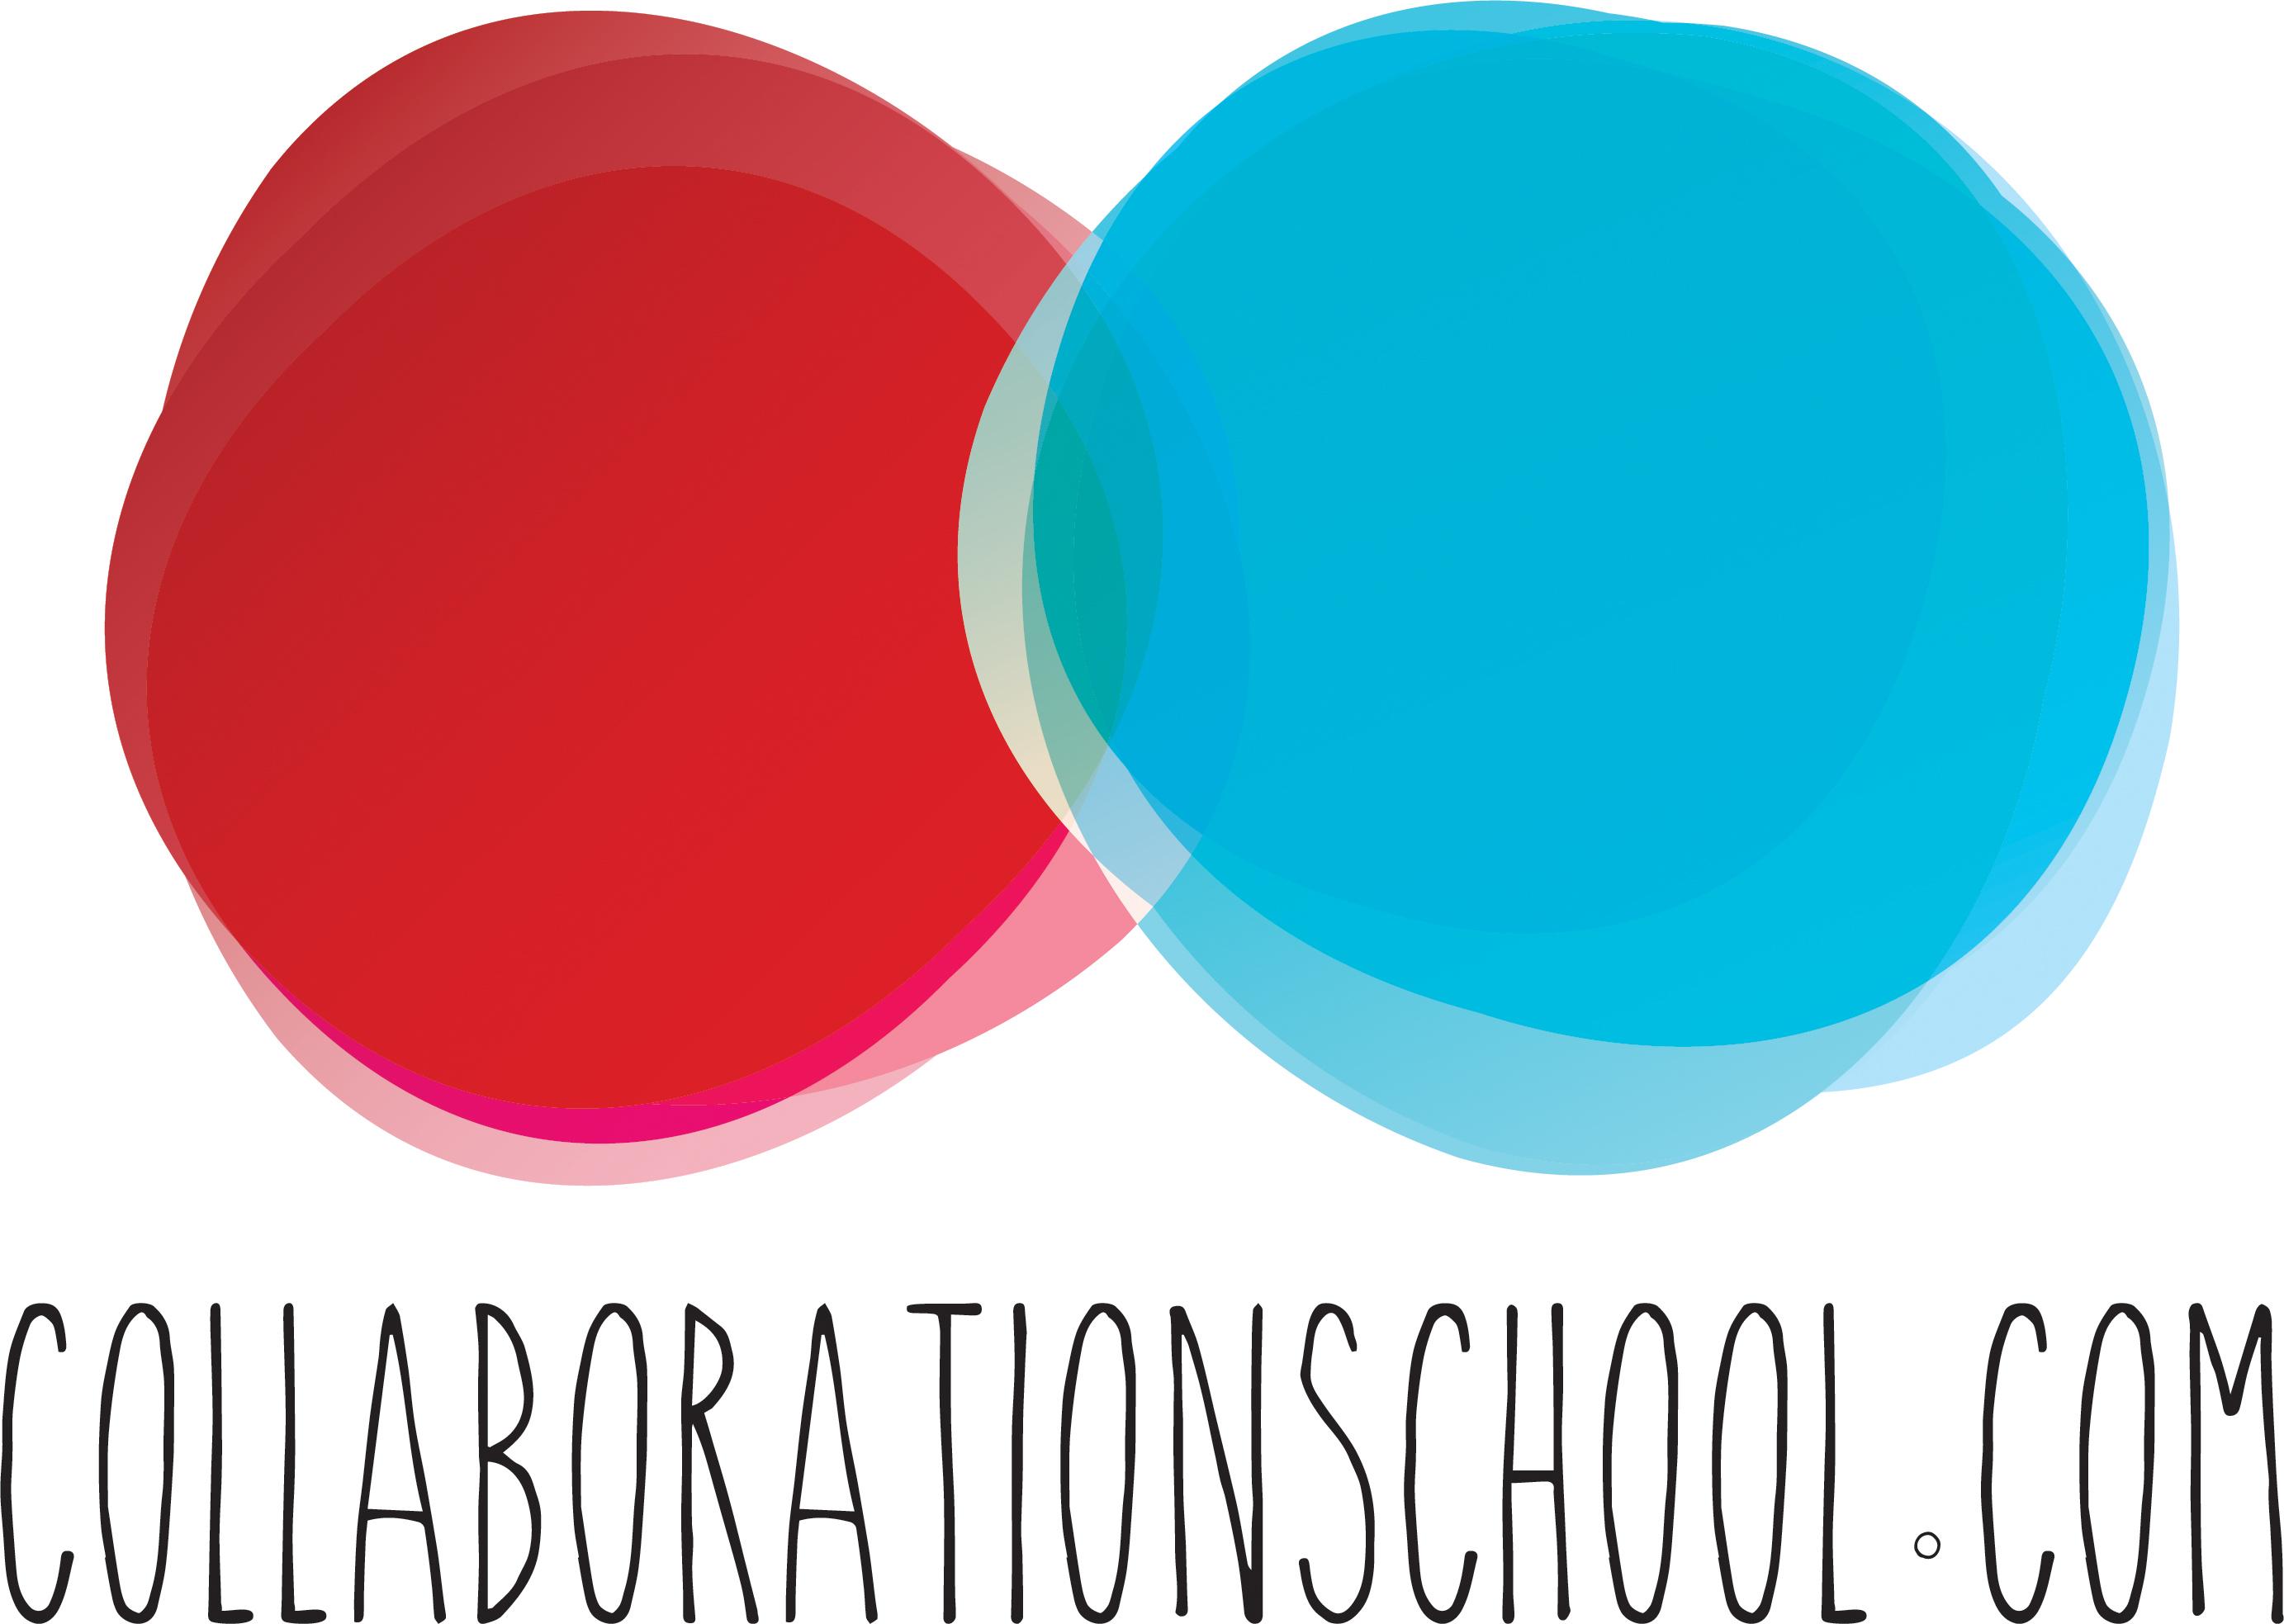 CollaborationSchool COL WEB